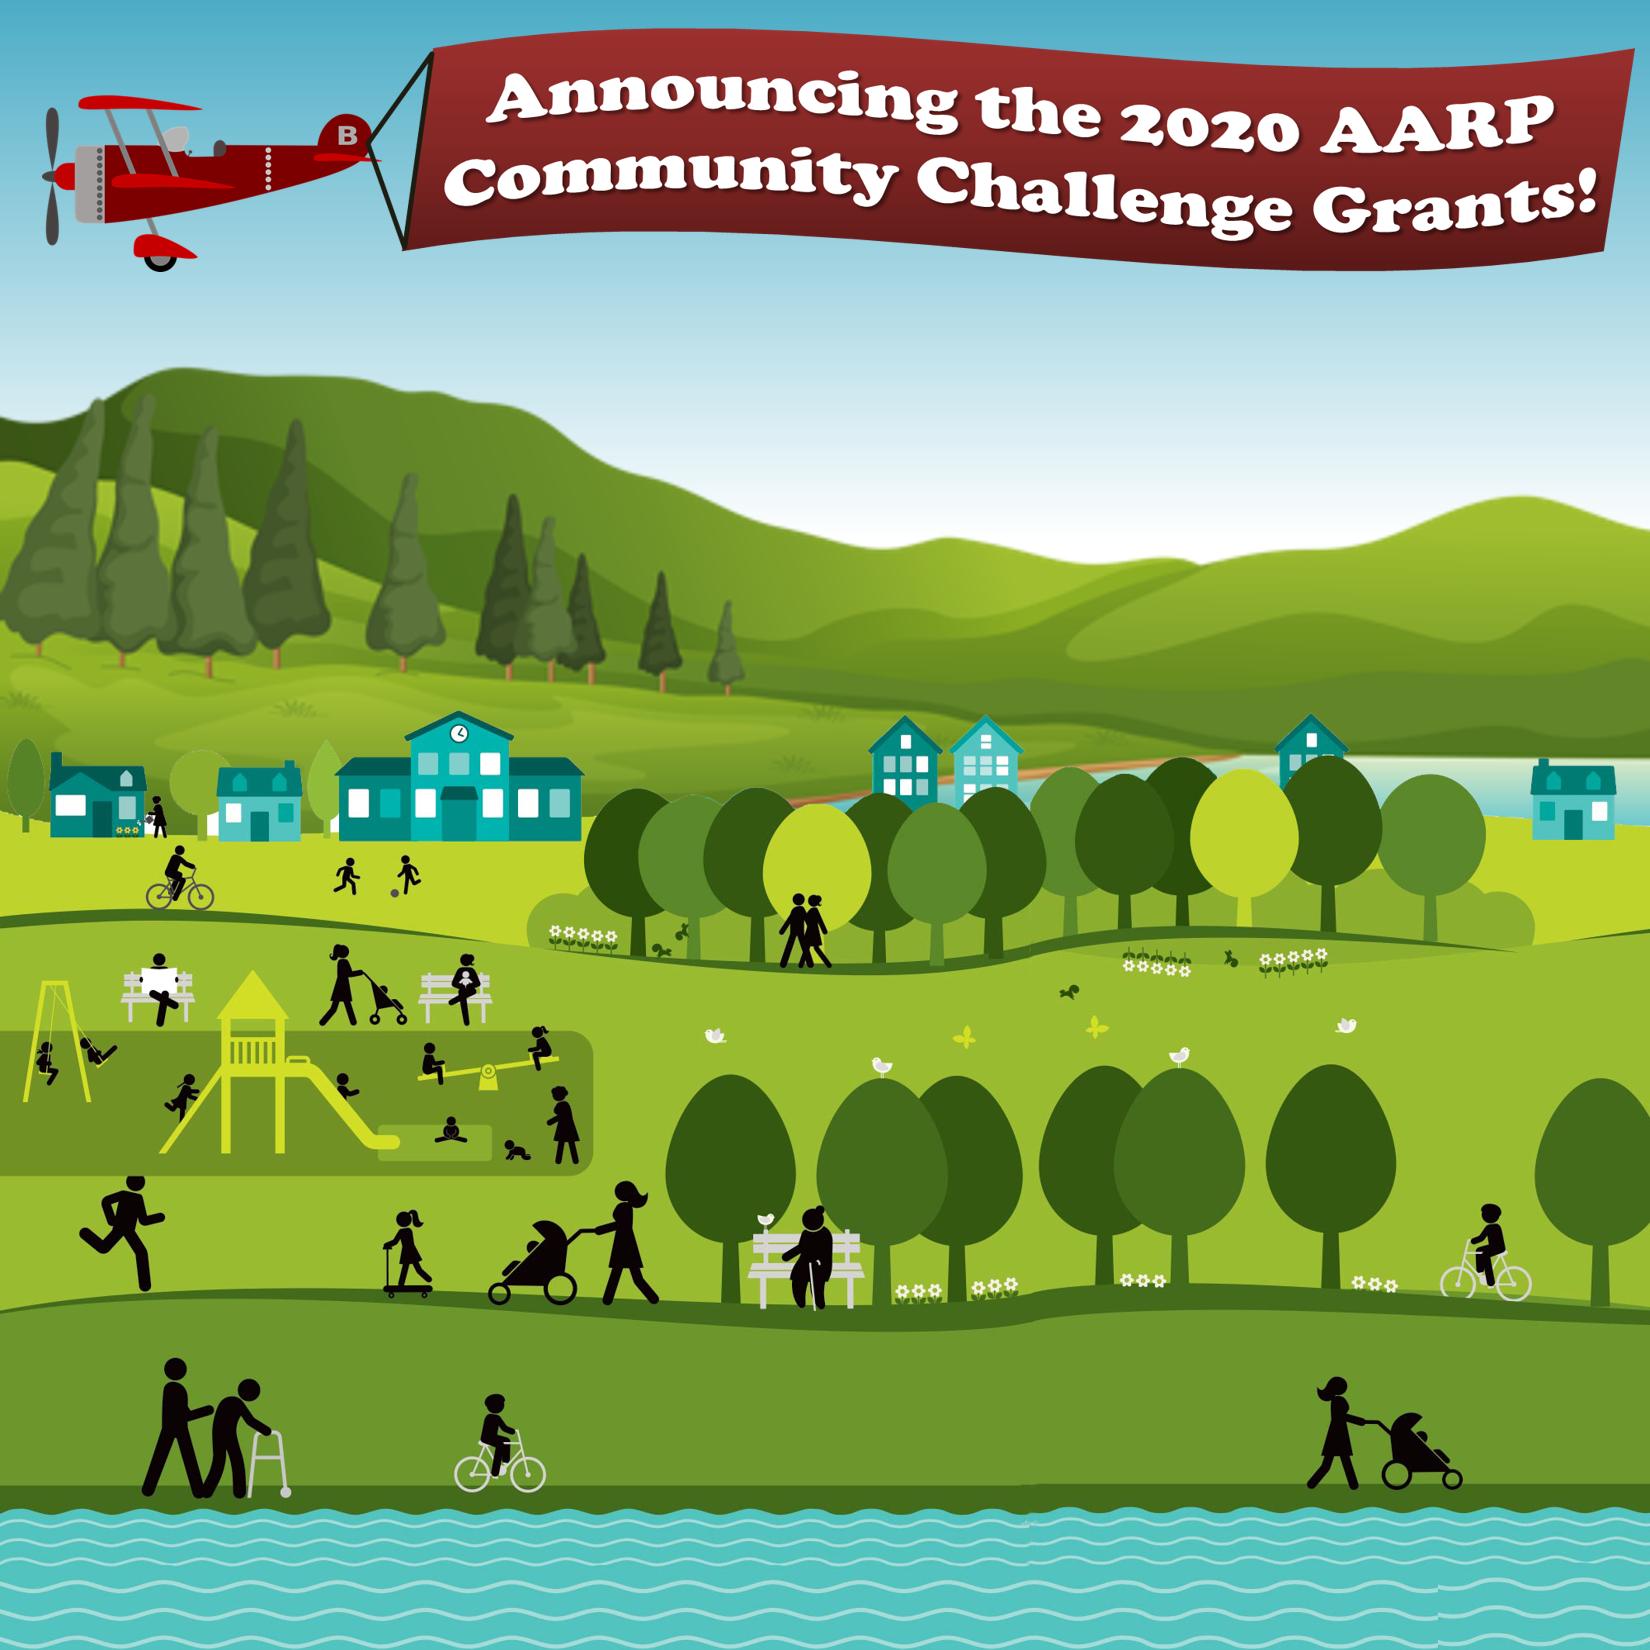 2020 Community Challenge Grants.png